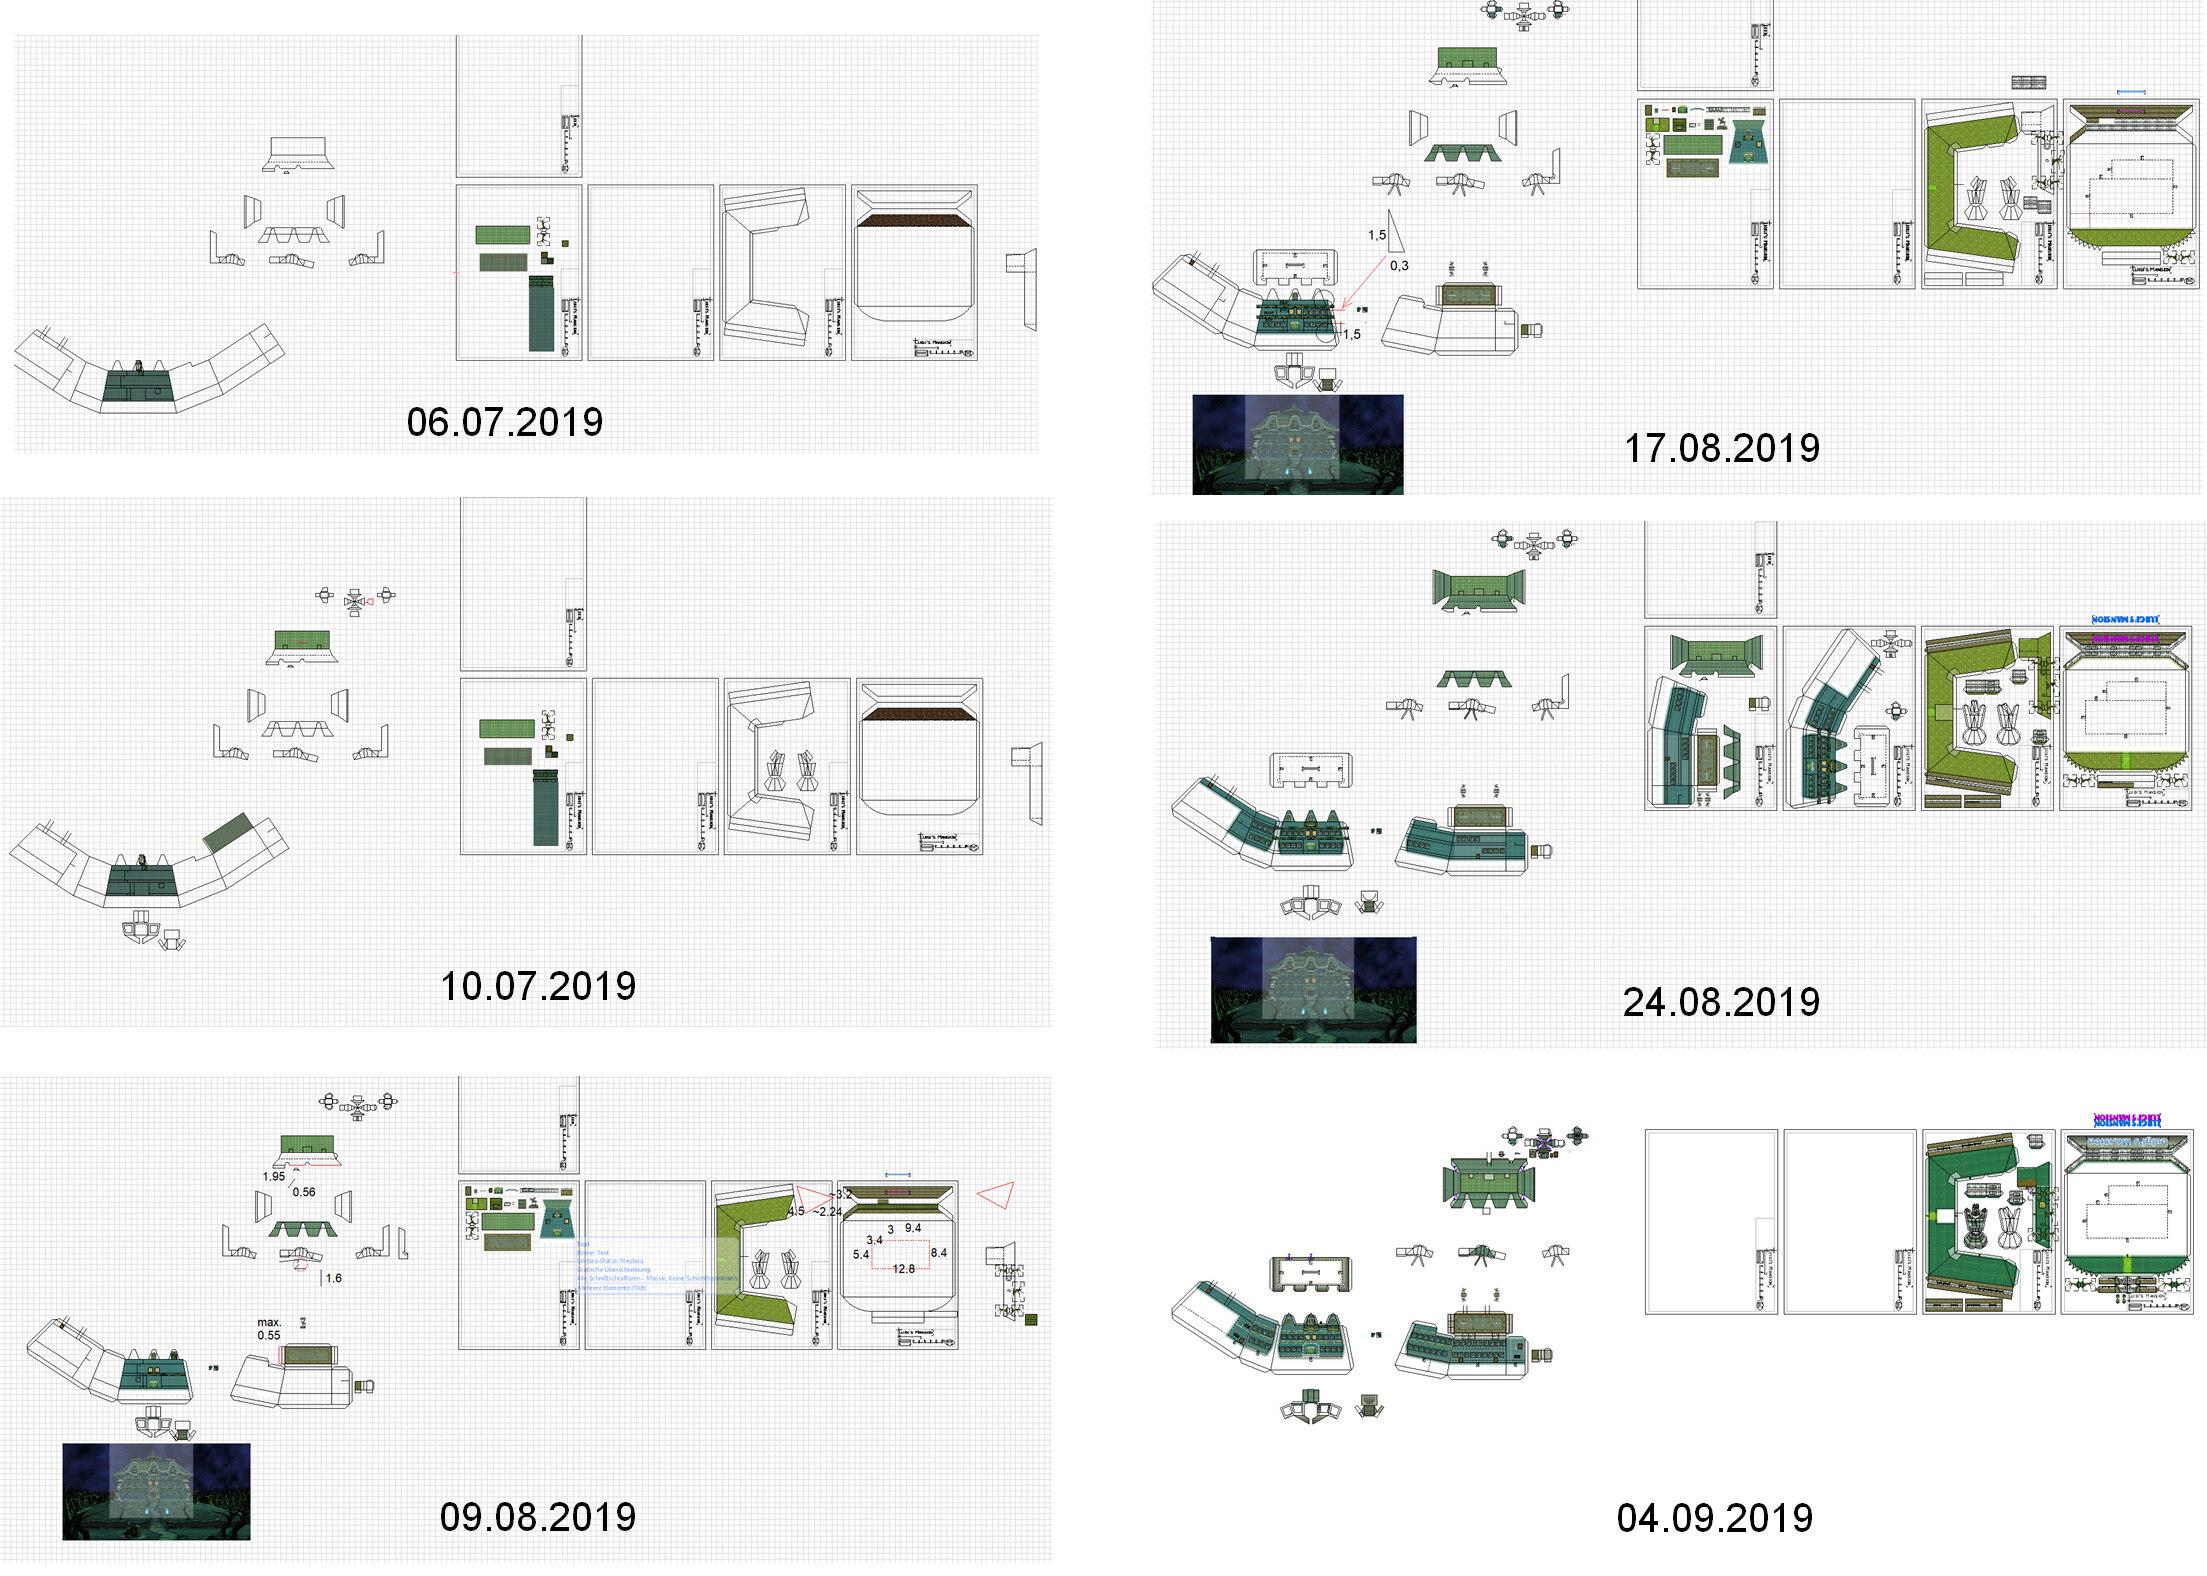 Luigi's Mansion - Die Gruselvilla aus dem Gamecube-Klassiker Lm_for10